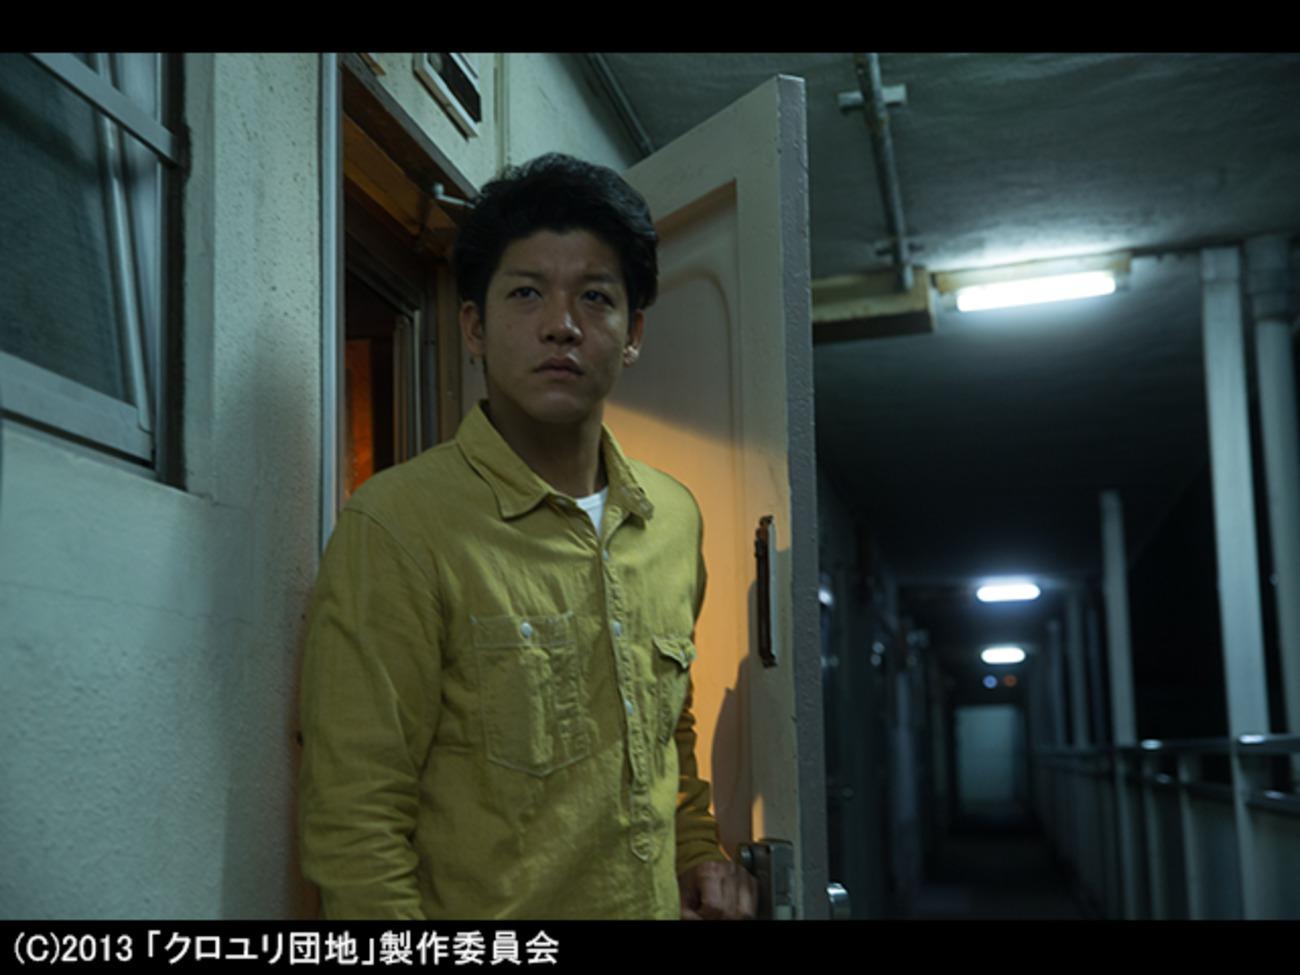 kuroyuri-jo-0610